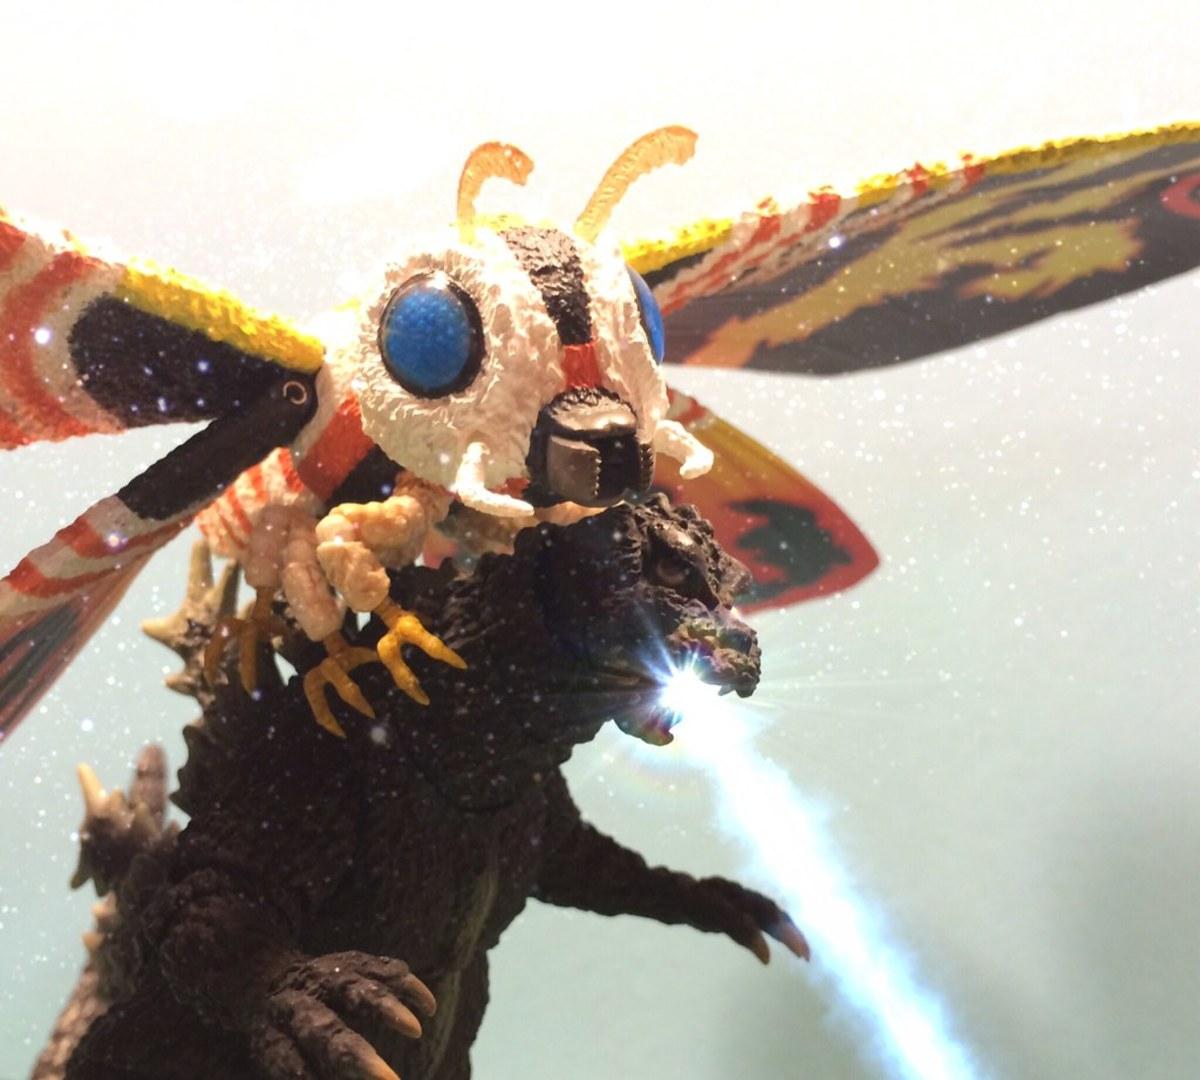 Mothra vs. Godzilla